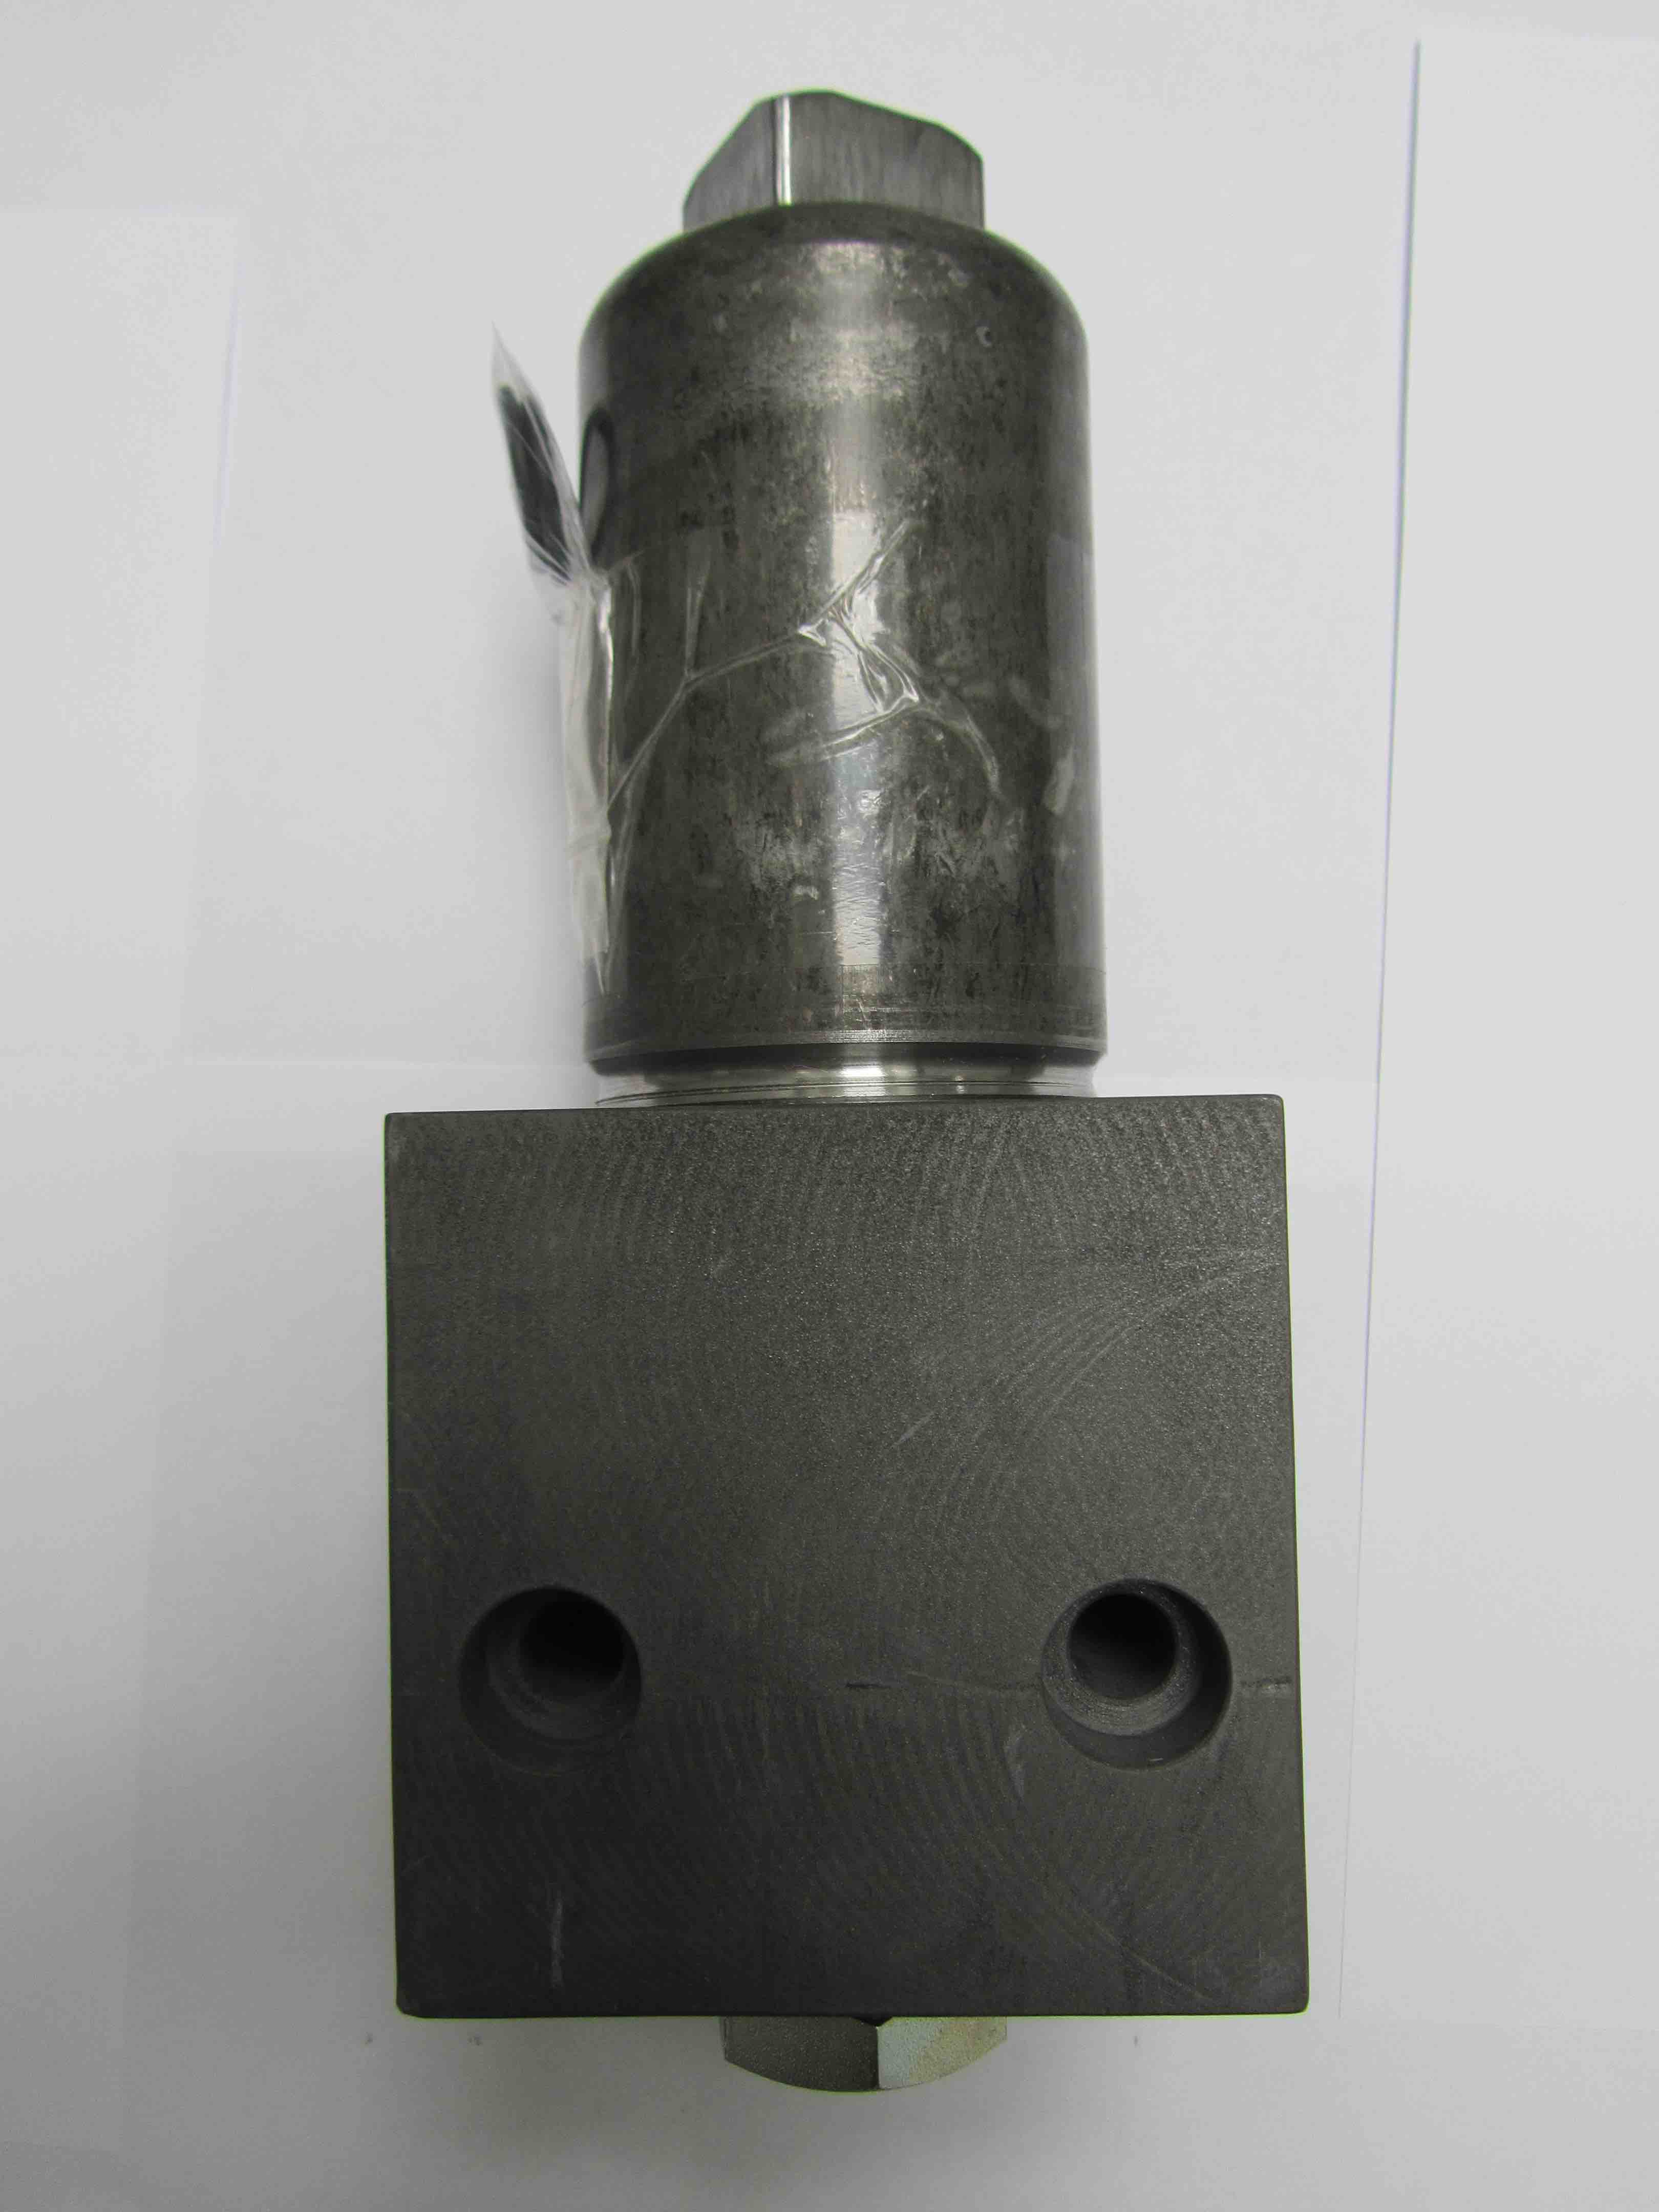 PFPF-10-0050 Pressure Filter